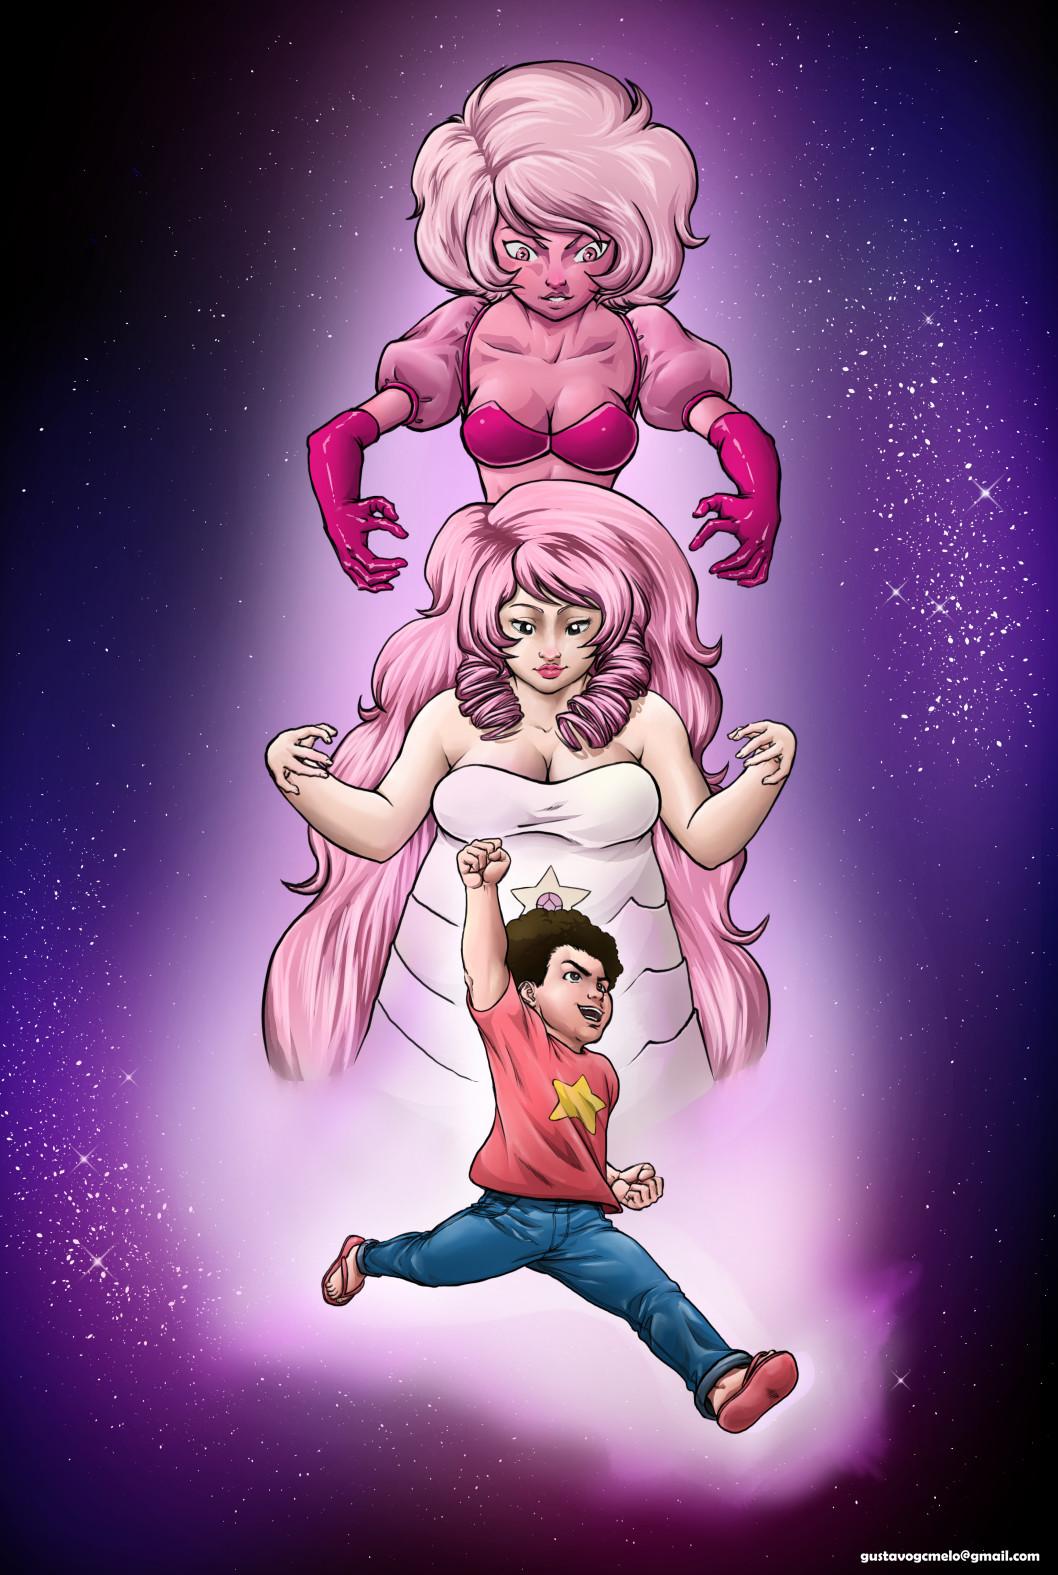 Gustavo melo steven universe fanart pink diamont color low